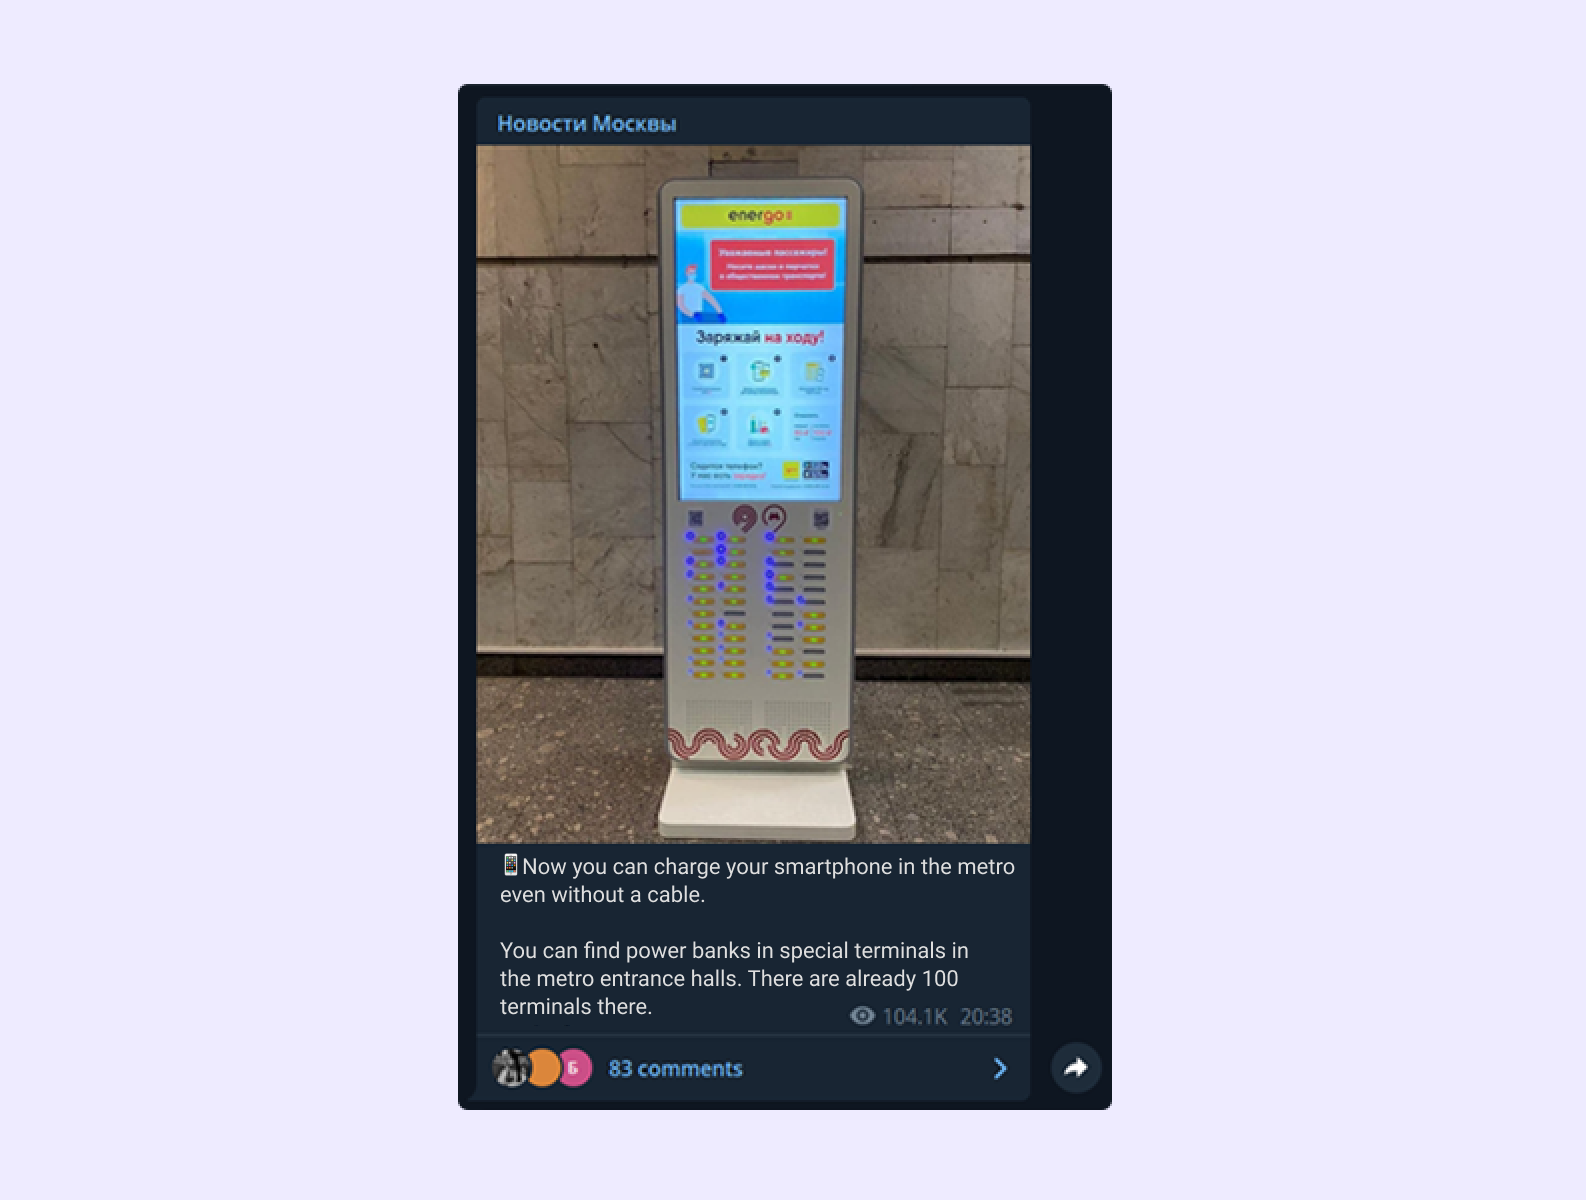 Telegram news about Energo stations in metro. IoT mobile app development.